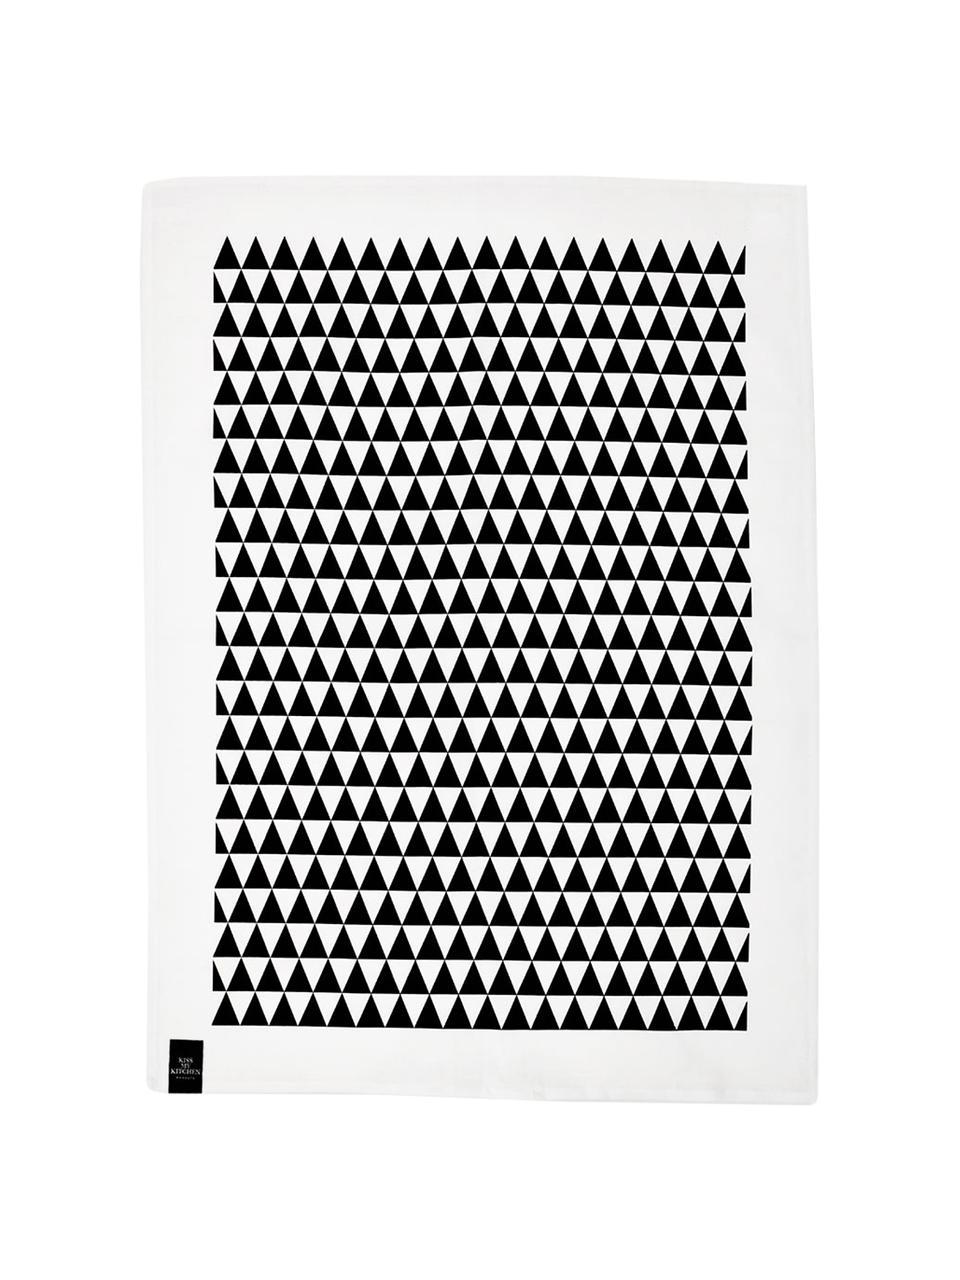 Halbleinen-Geschirrtücher Dreieck, 2 Stück, 50% Leinen, 50% Baumwolle, Weiß, Schwarz, 50 x 70 cm